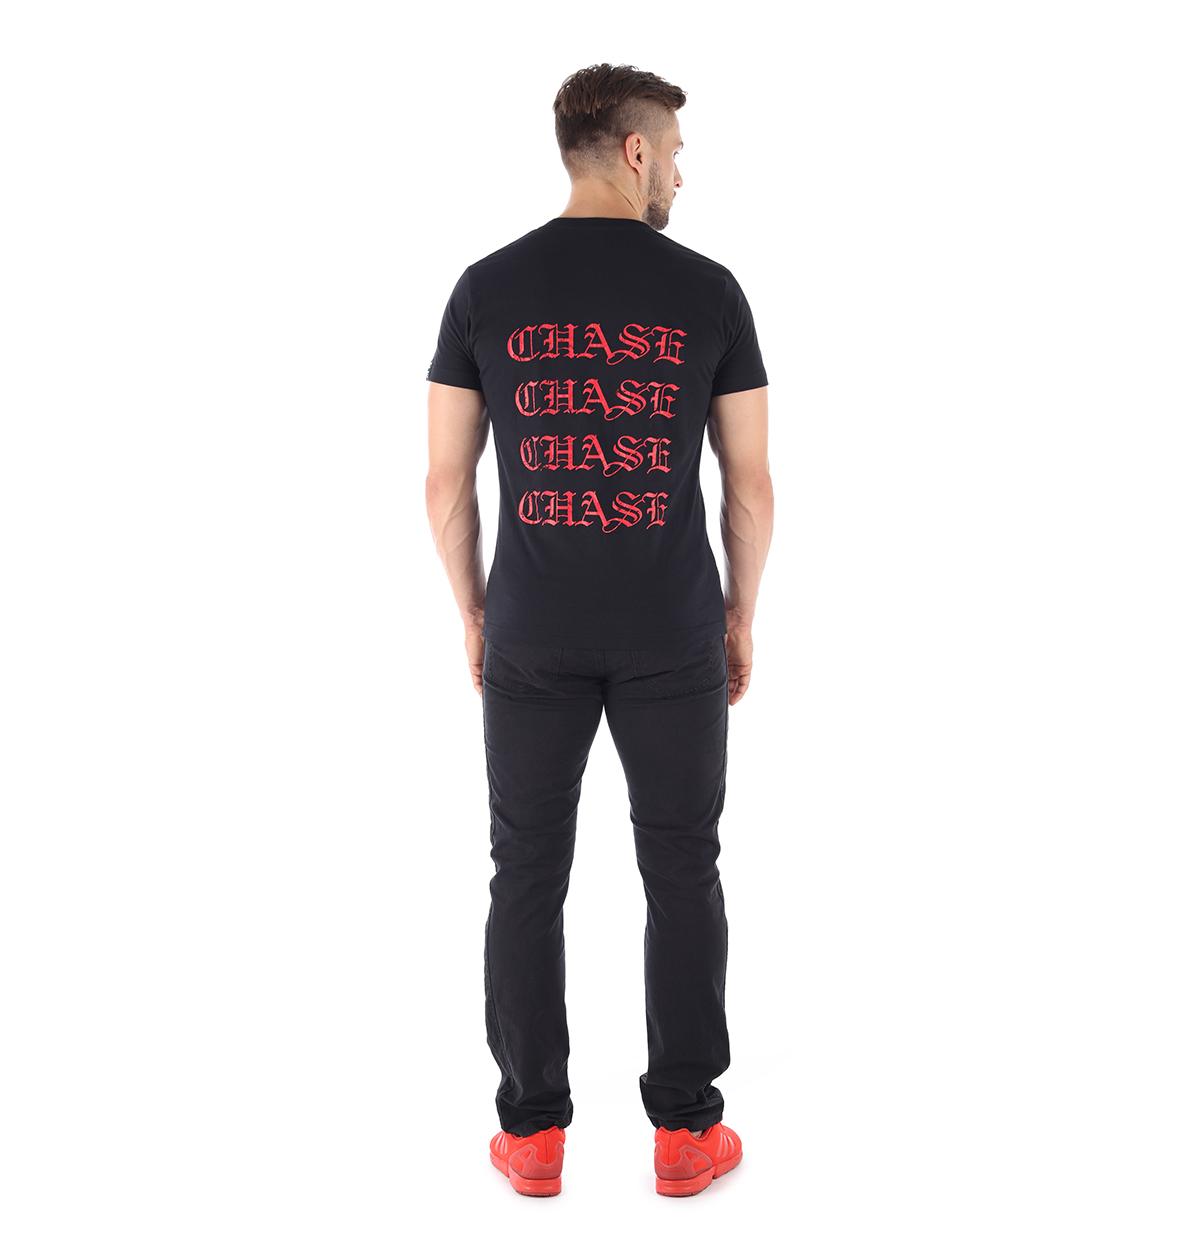 black_chase_repeat_back.jpg